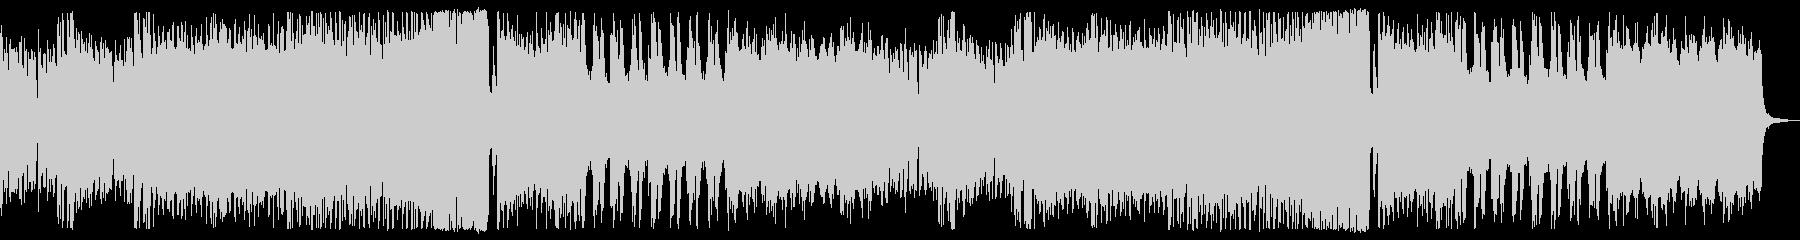 Rocknweenの未再生の波形